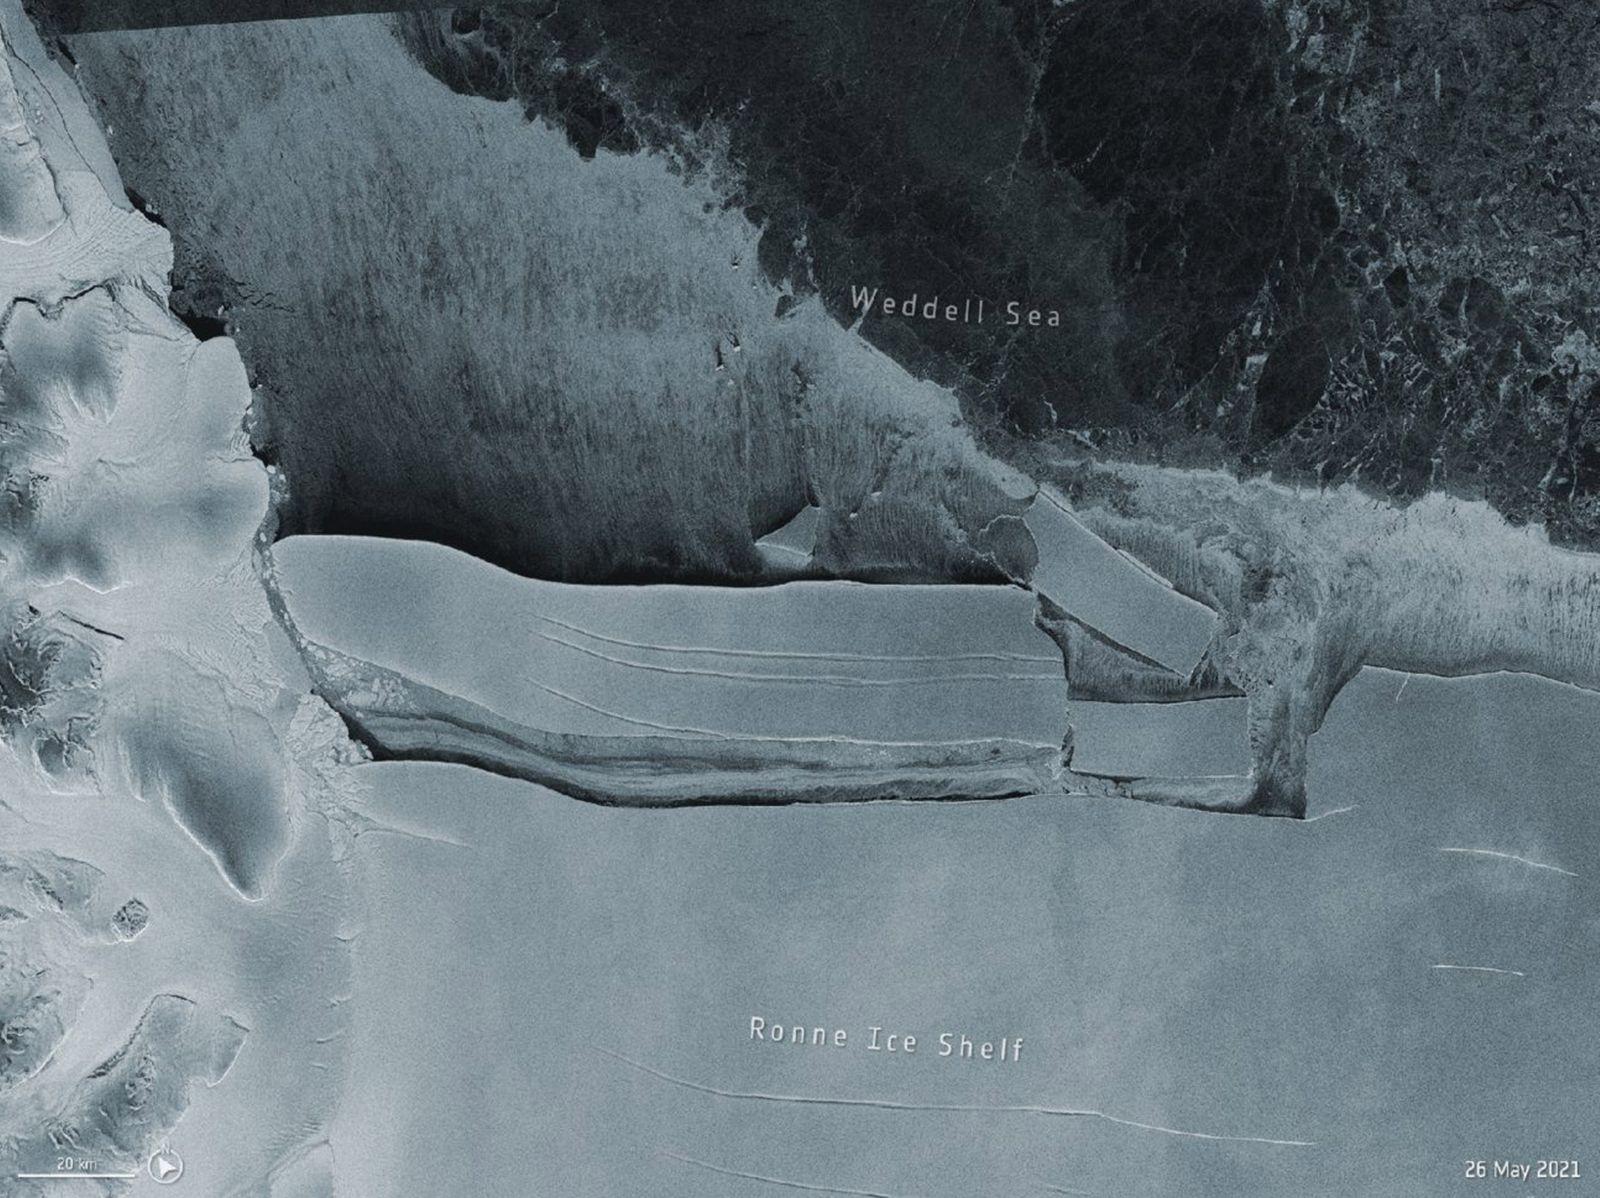 Antarctica's A-76 iceberg loses two big chunks of ice